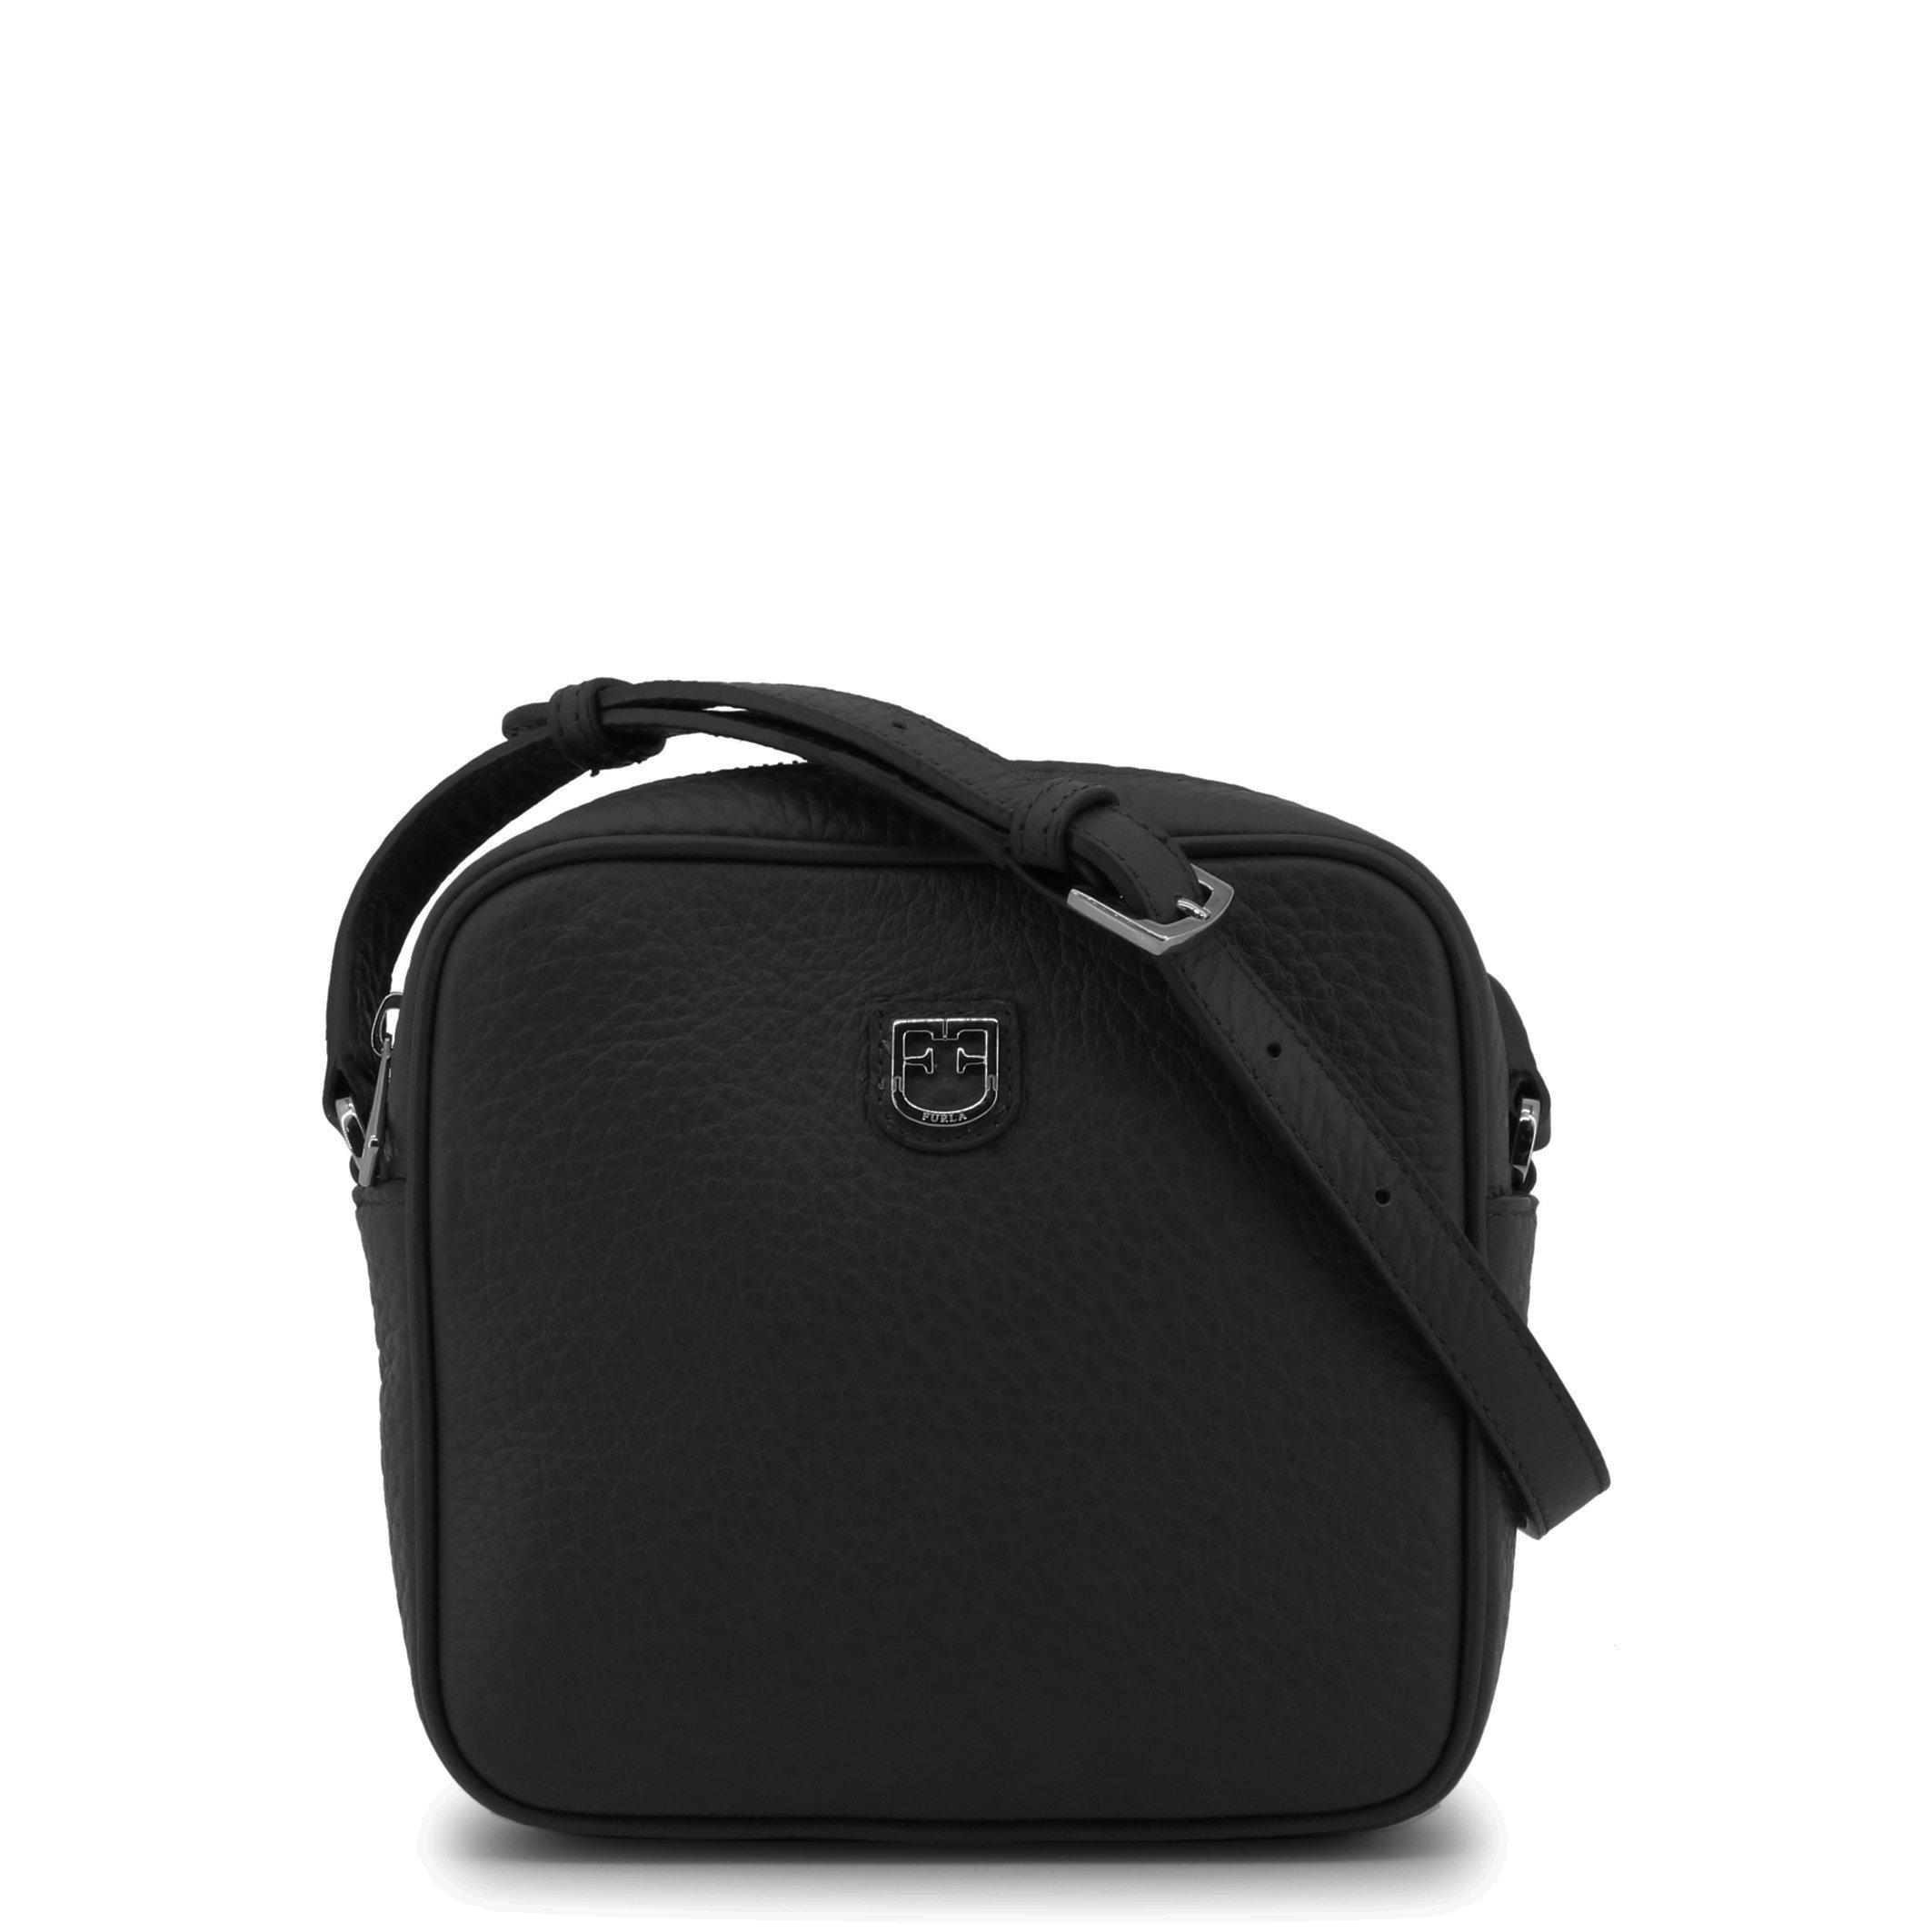 Furla Women's Crossbody Bag Various Colours DOTTY_WB00058 - black NOSIZE